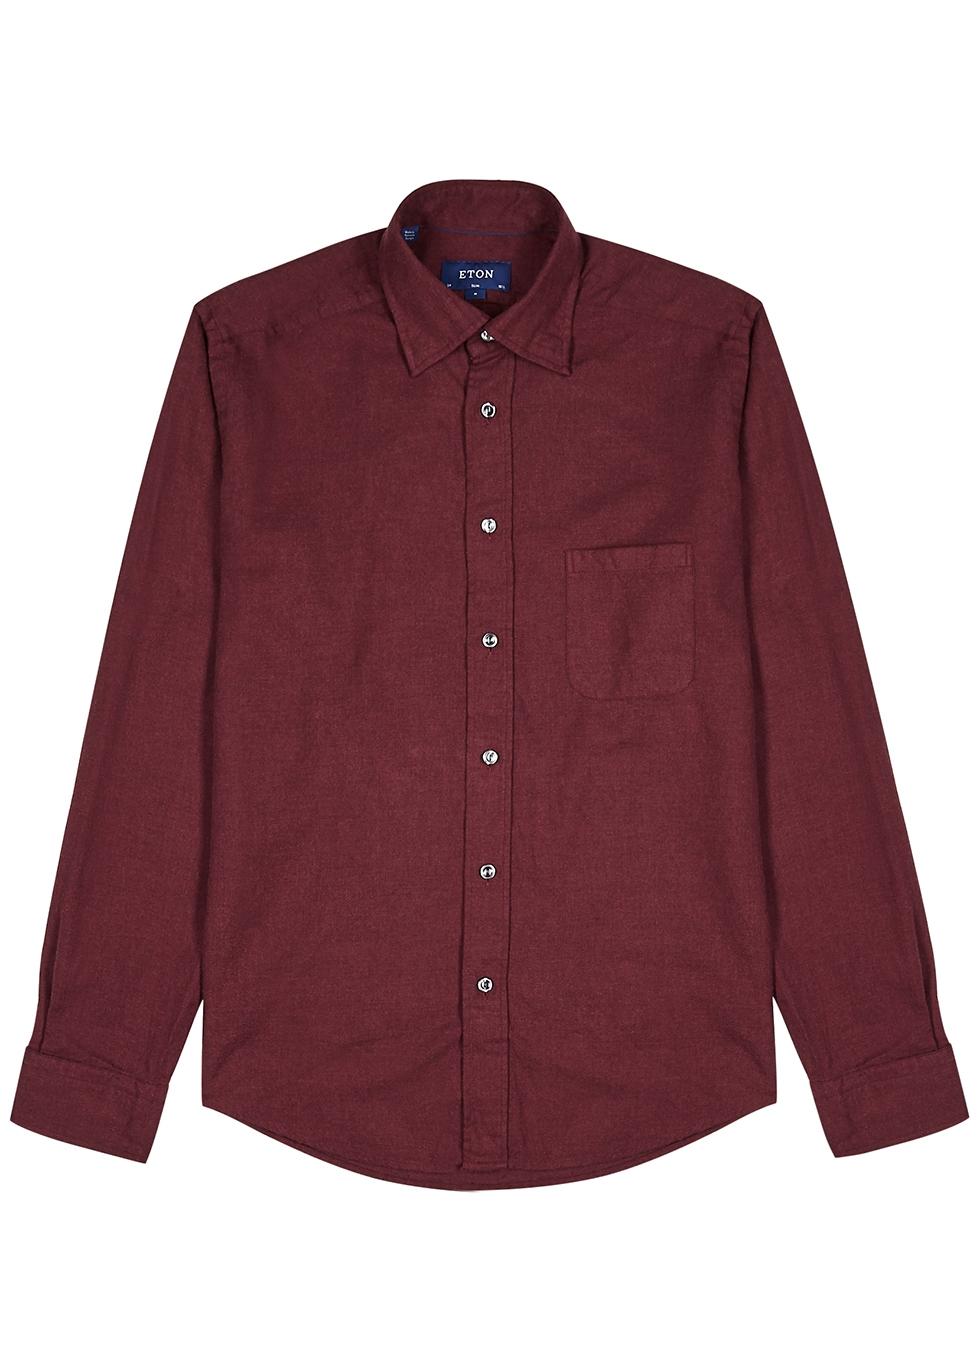 Burgundy brushed cotton shirt